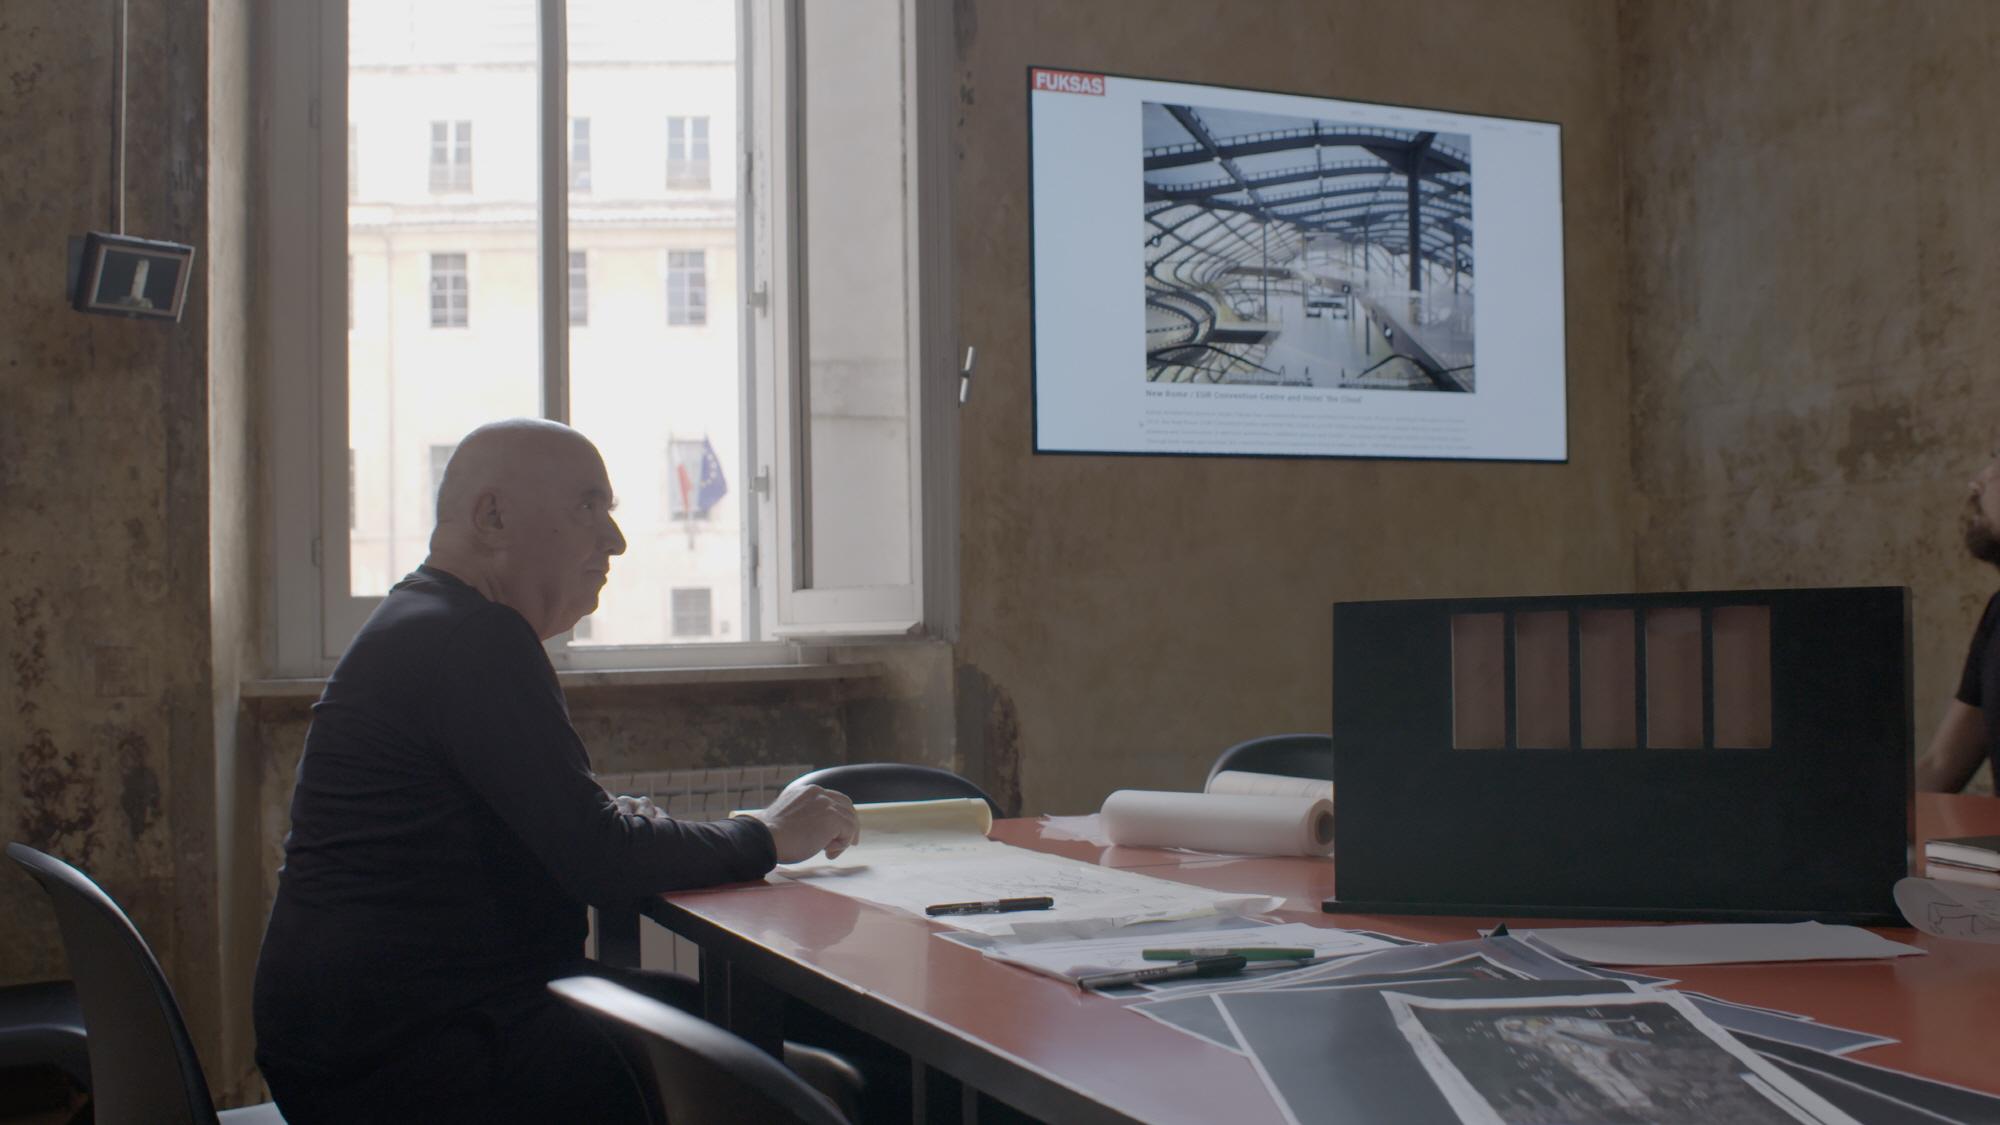 G전자가 다음 달 독일 베를린에서 열리는 IFA 2019에서 이탈리아 유명 건축가 '마시밀리아노 푹사스'(사진)와 함께 조성한 LG 시그니처 부스를 선보인다.